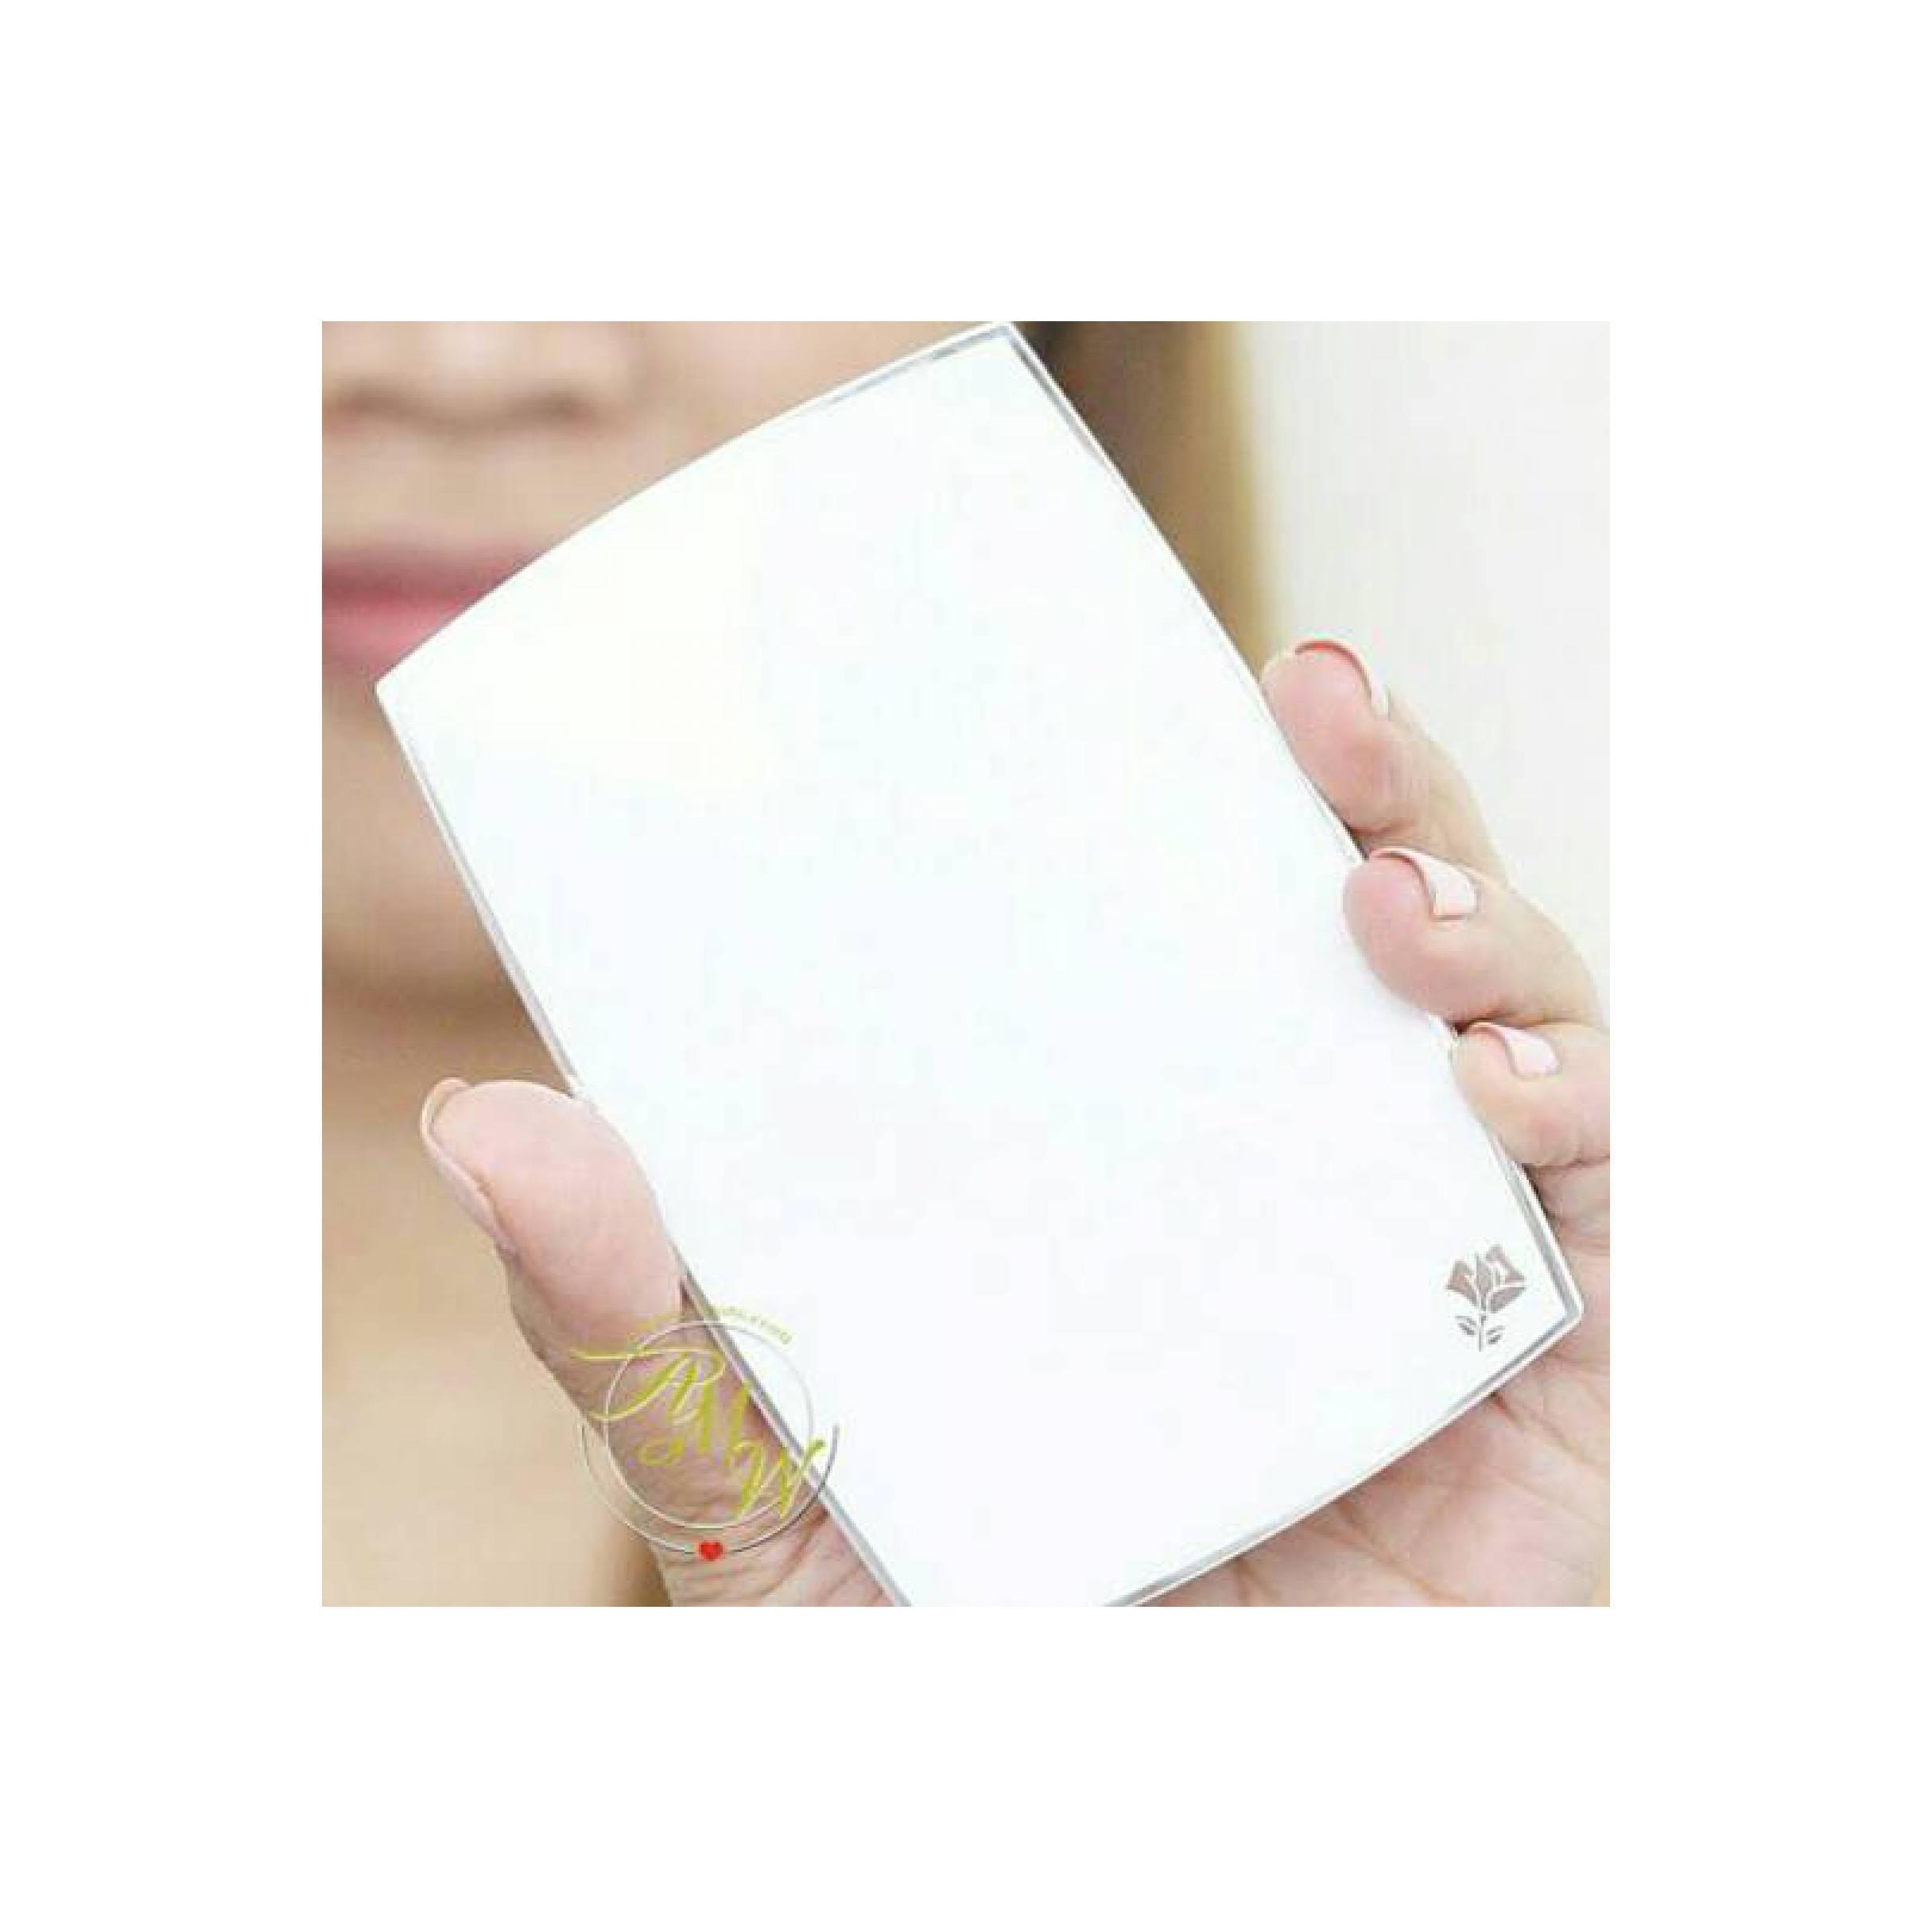 Lancome blanc expert compact powder foundation shade 001